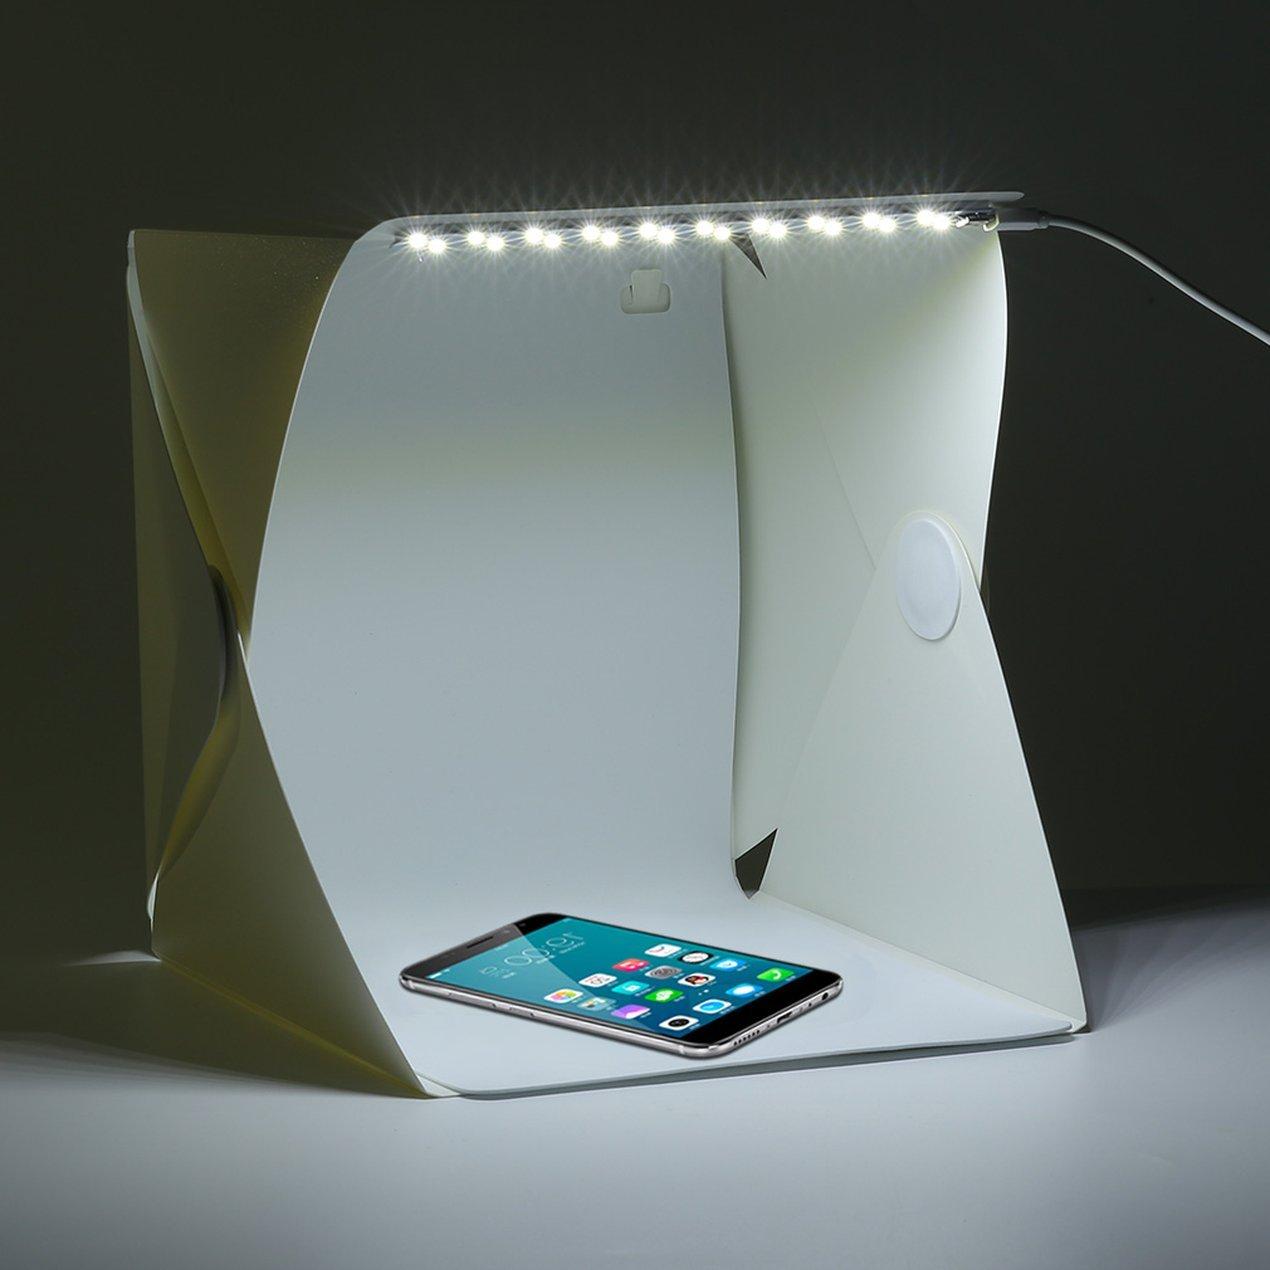 Photo Studio Box for Everybody Foldable Photography Studio Kit with LED Light 22cm*22cm Photo Box Mini Light Tent White,